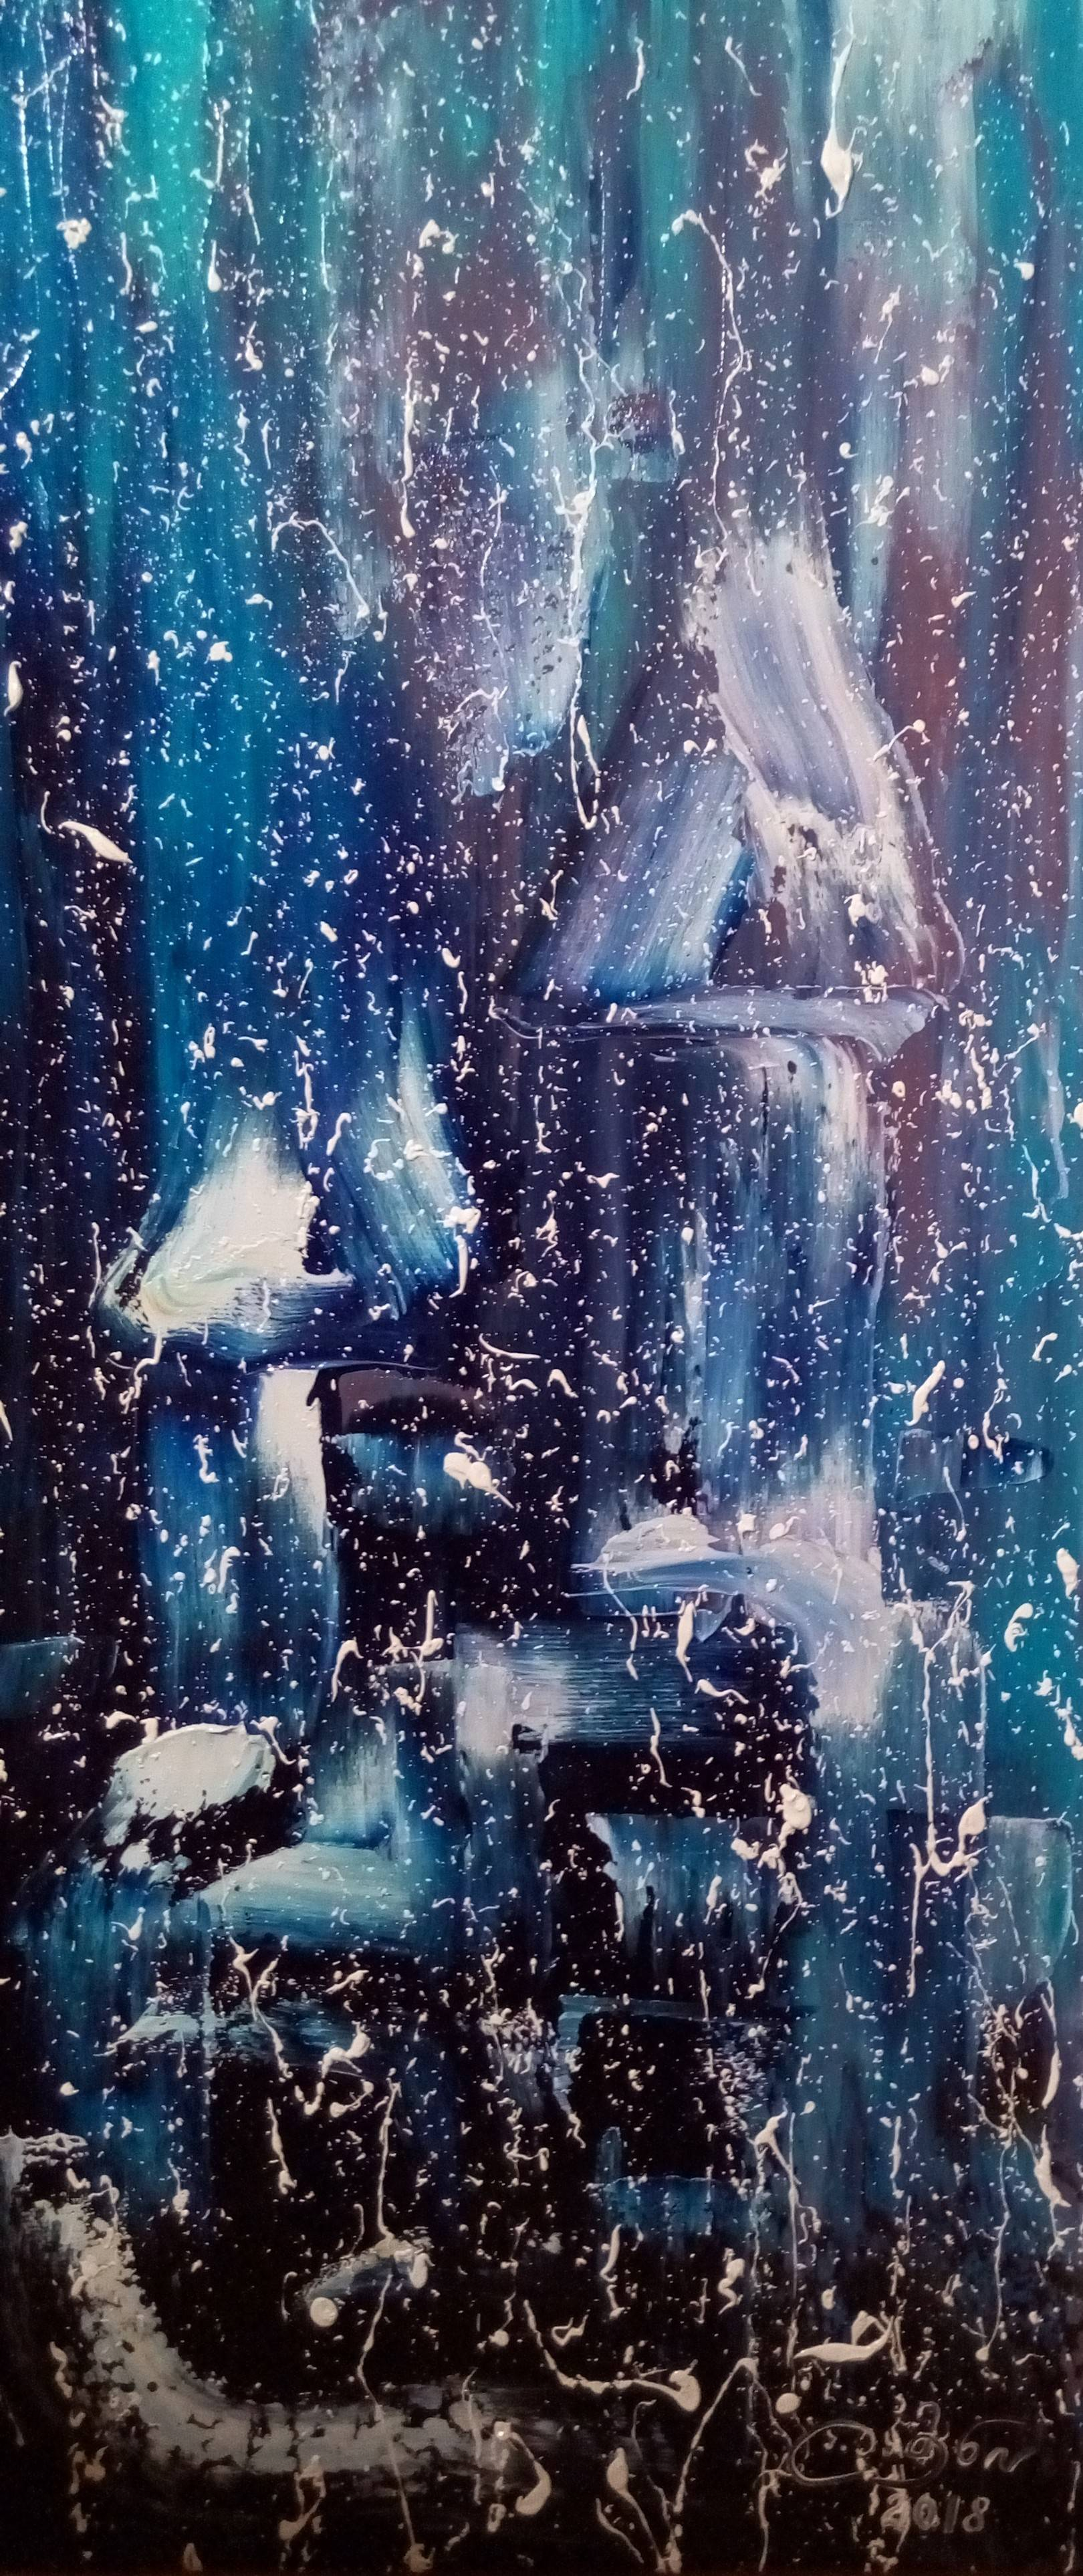 «Ночной зимний город»    холст, масло «Night city in the winter»    oil on canvas  30x70,  2018